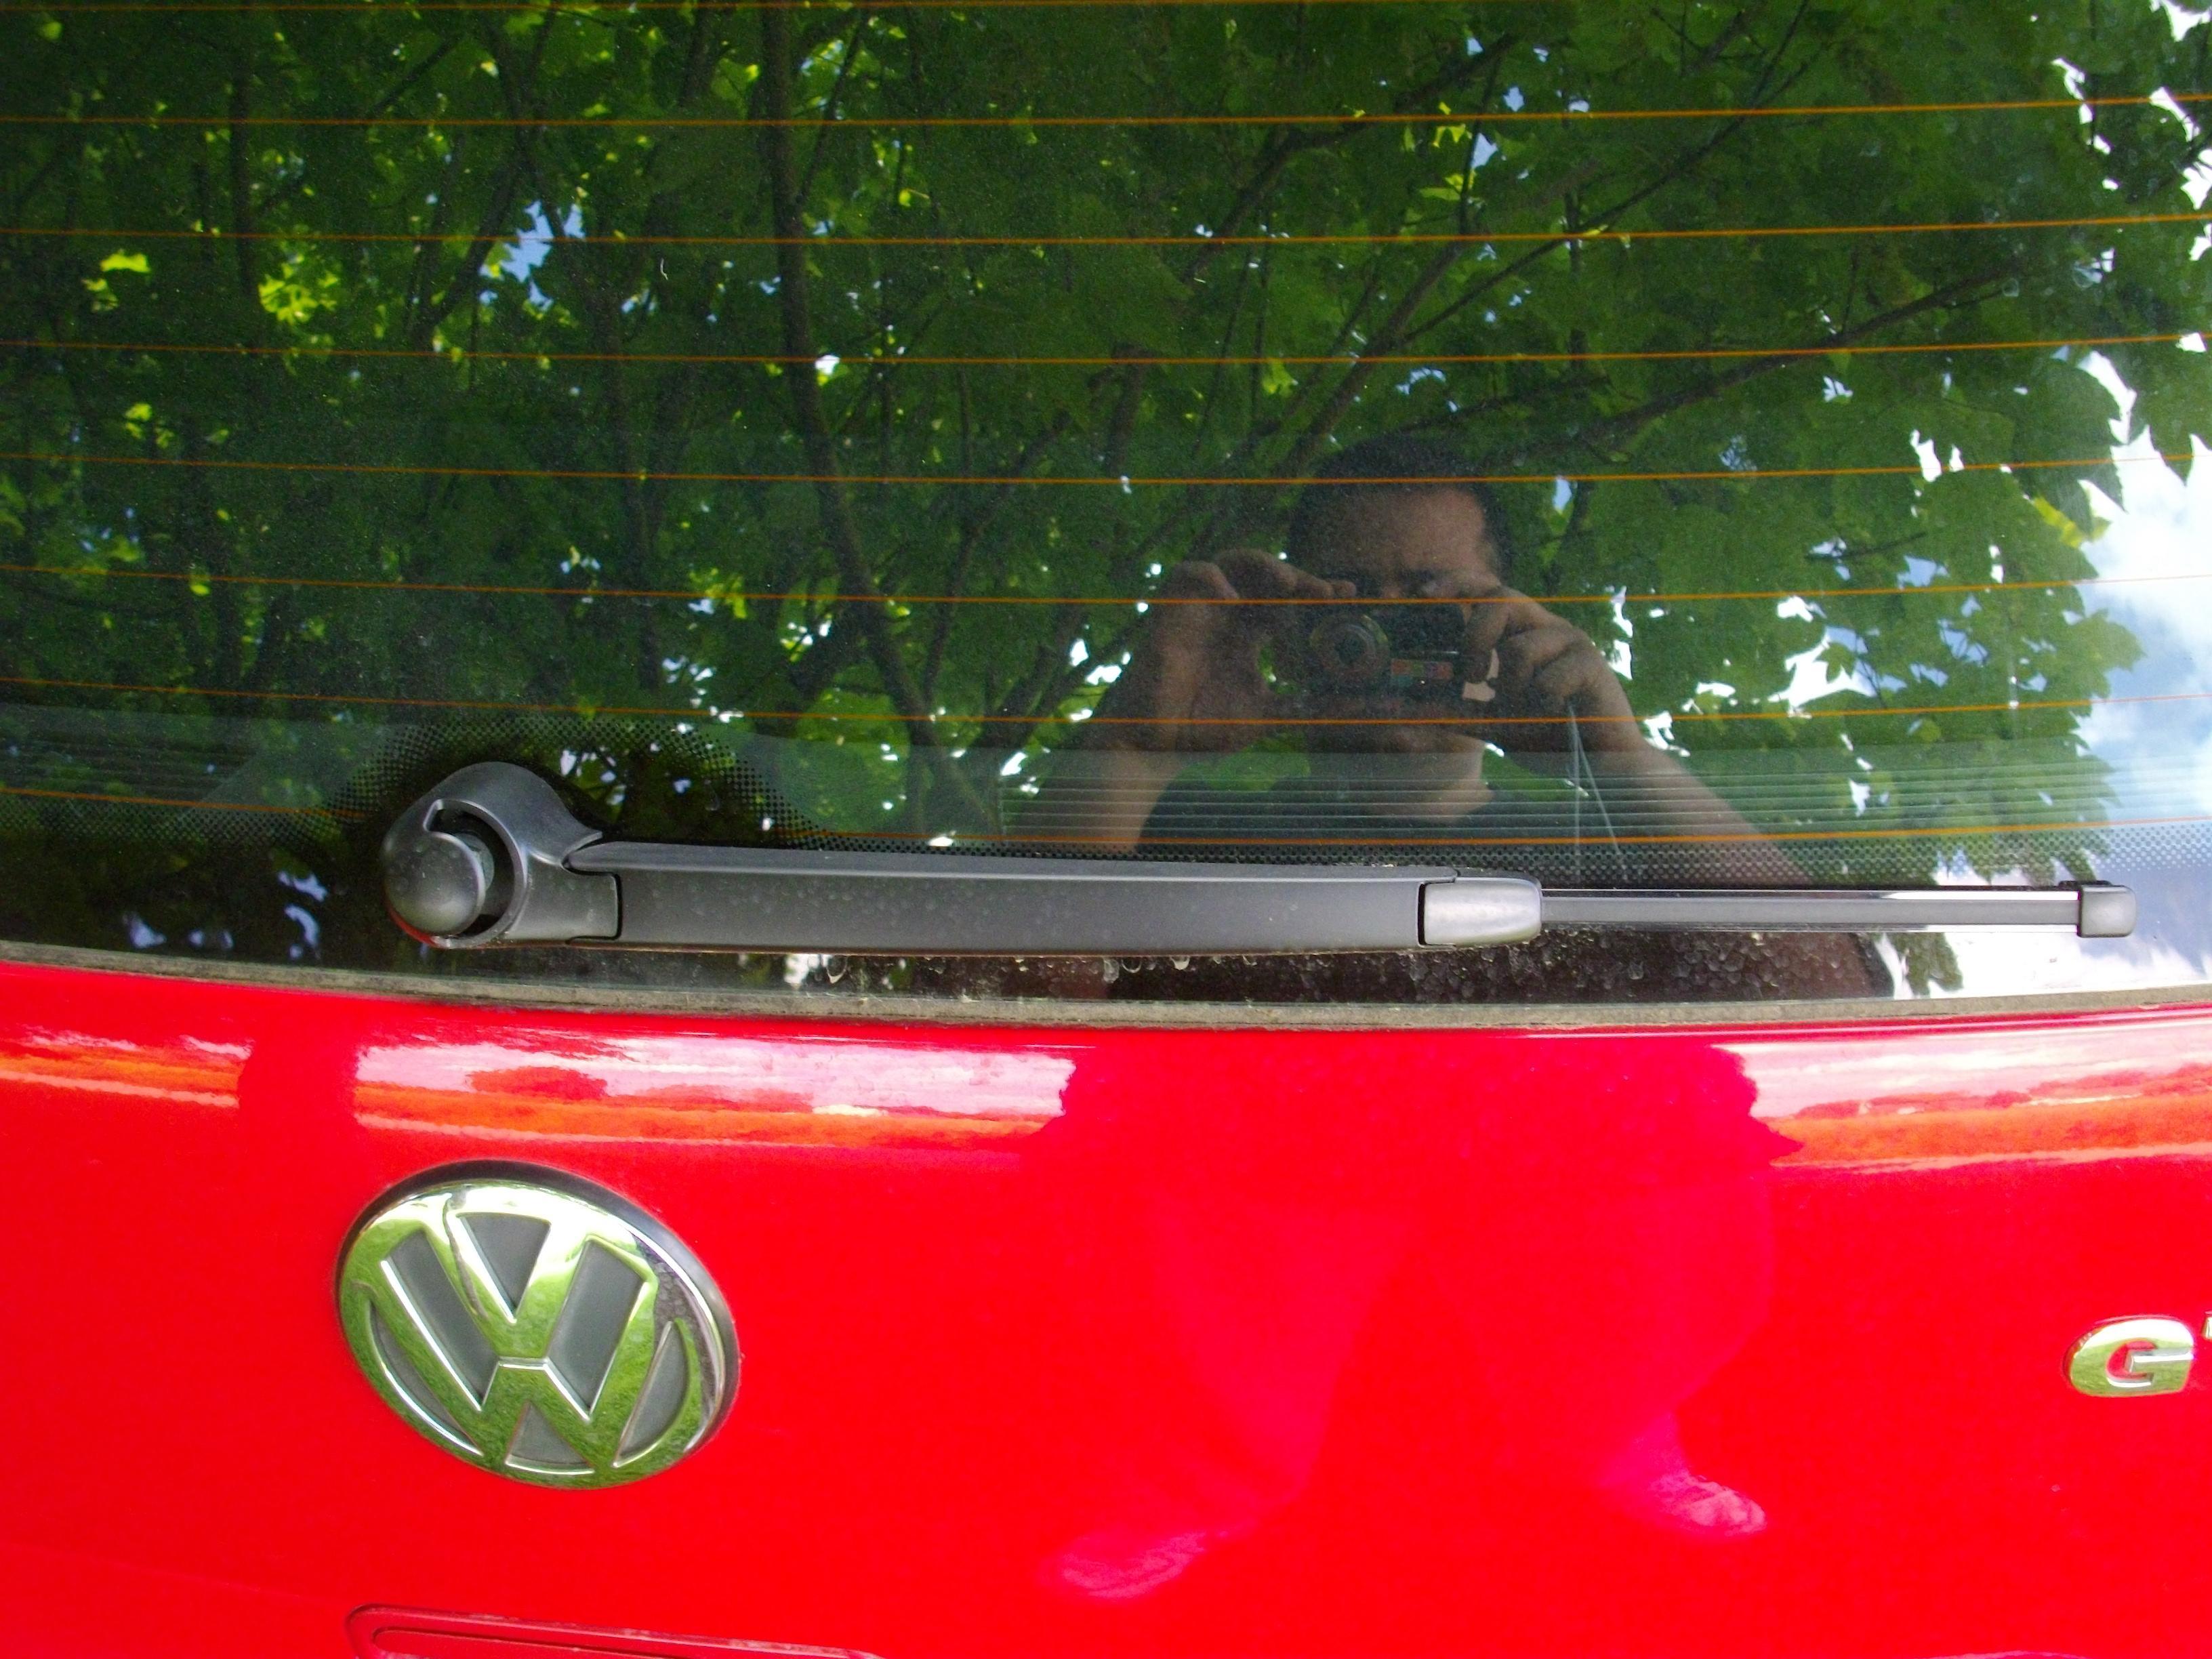 Golf 4 mrc de freko garage des golf iv 1 8 1 8 20v 1 for Garage turbo igny